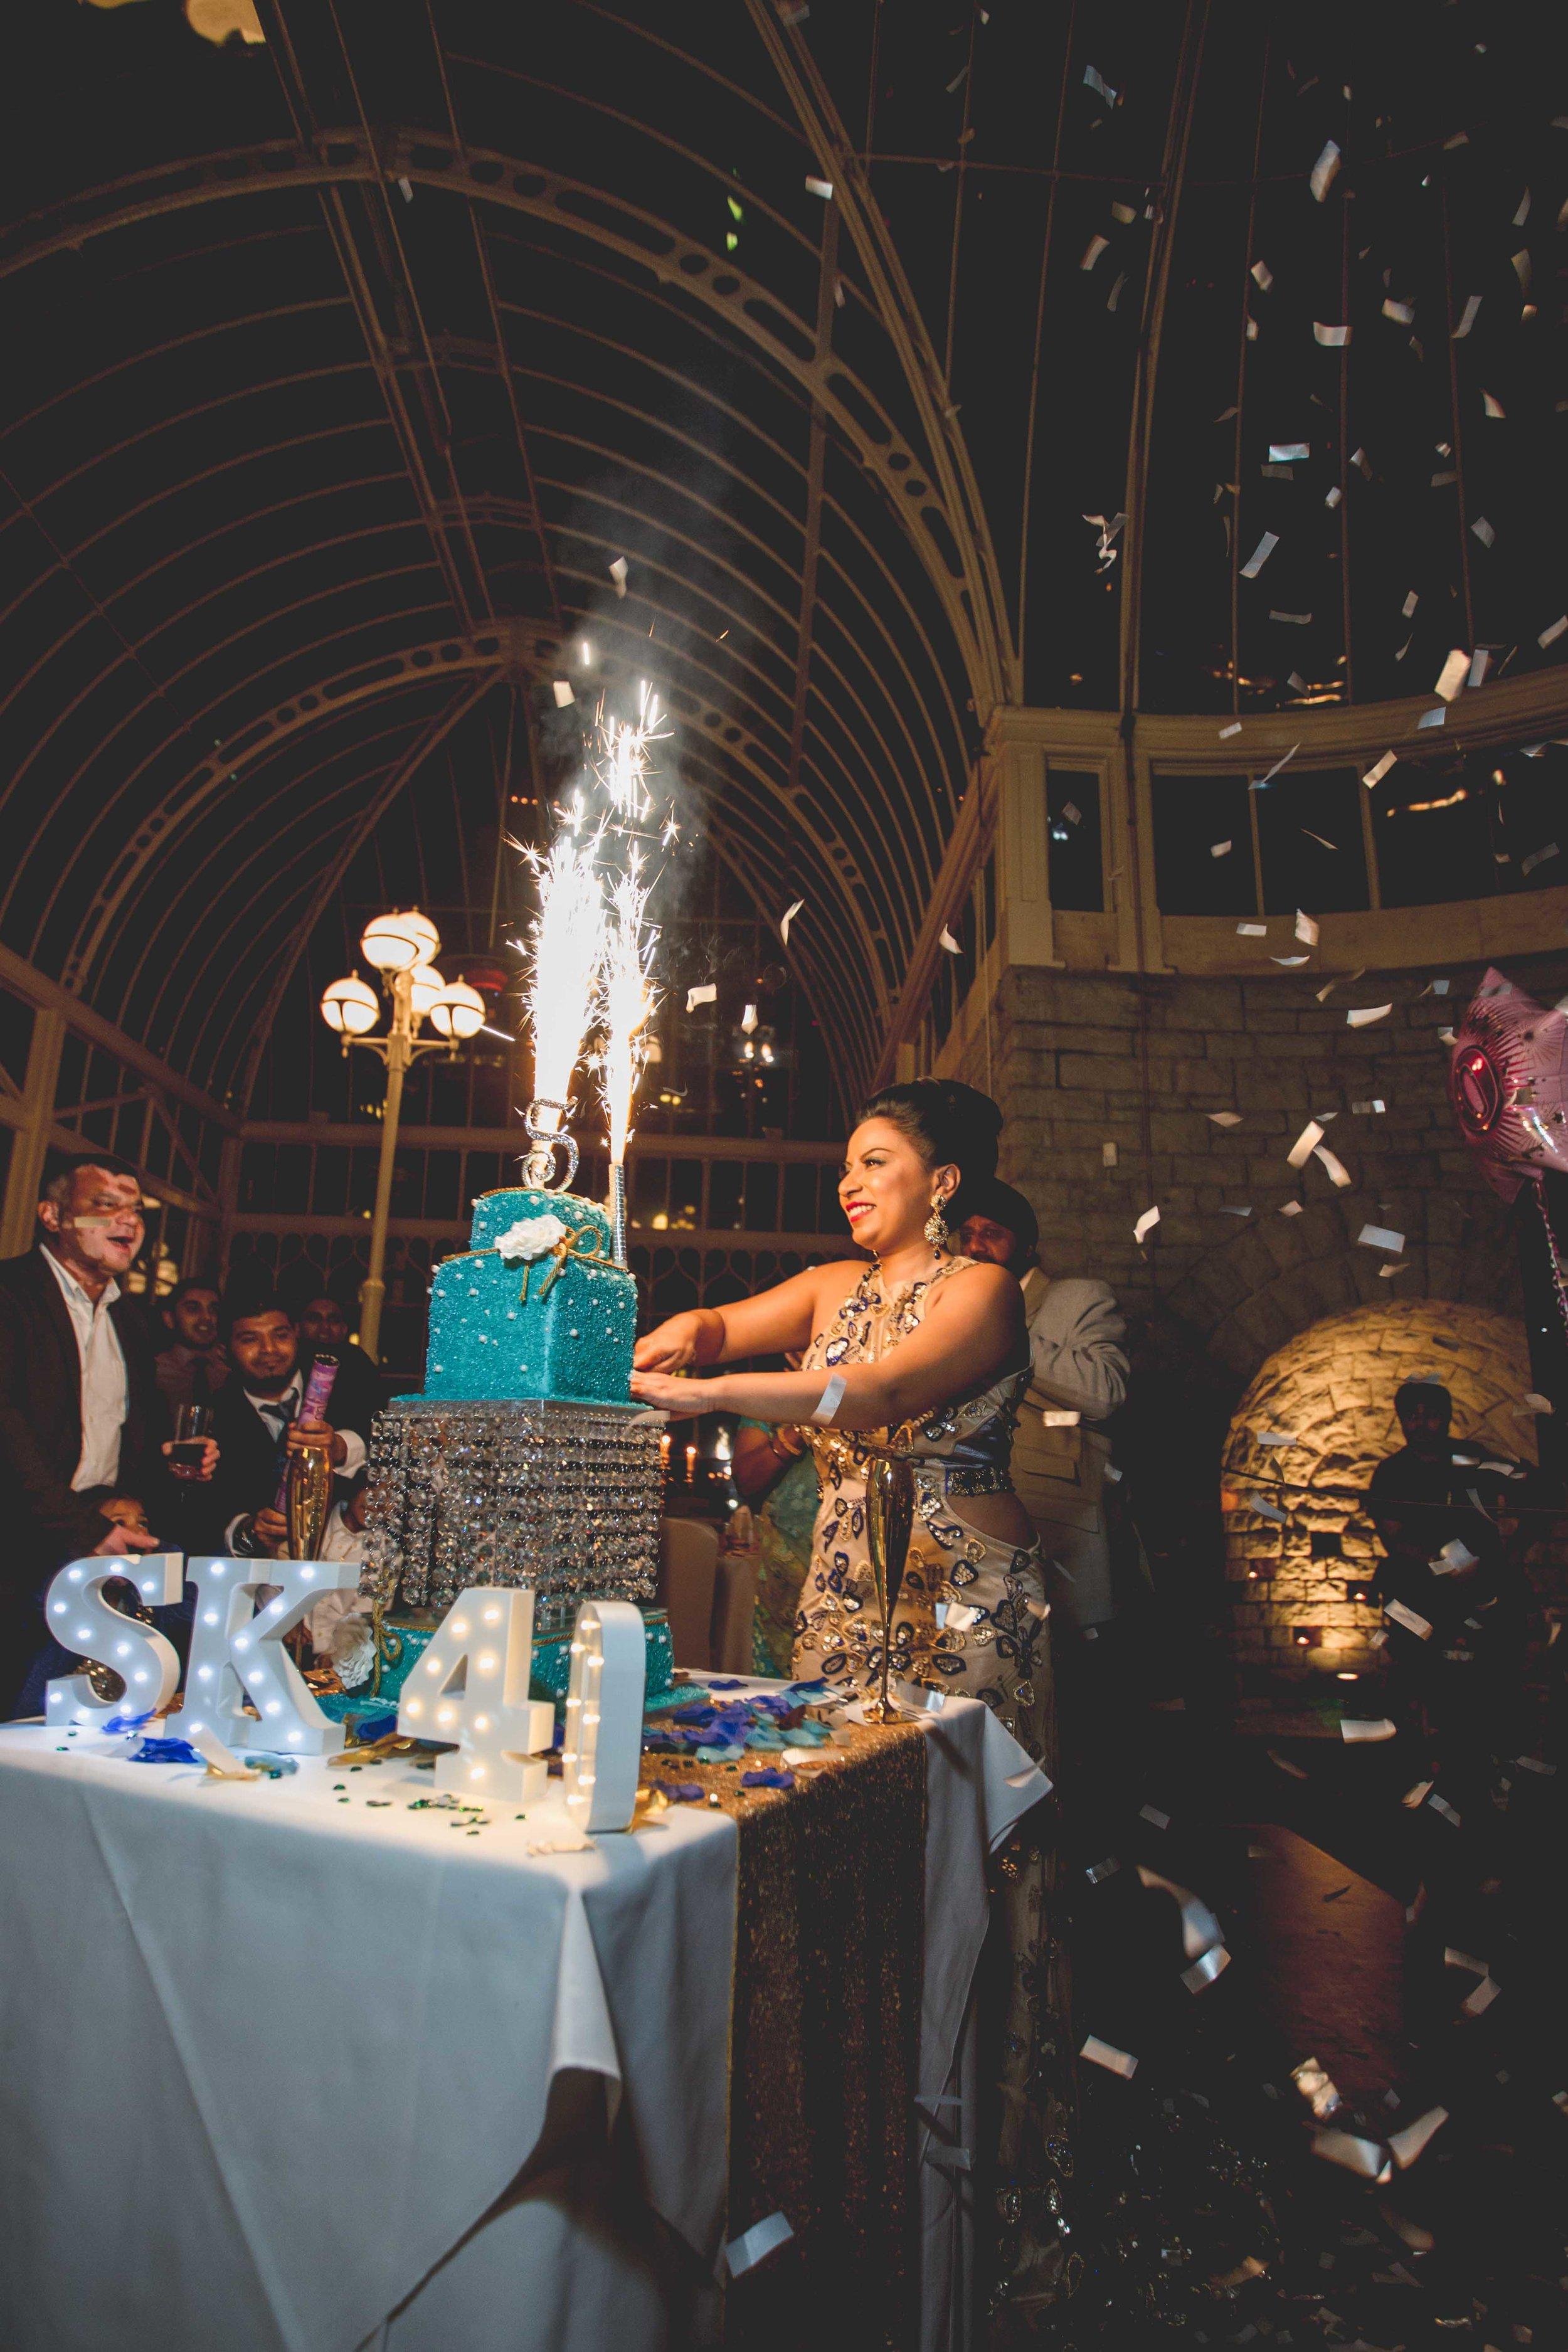 tortworth-Hotel-gloucester-birthday-wedding-photographer-natalia-smith-photography-21.jpg